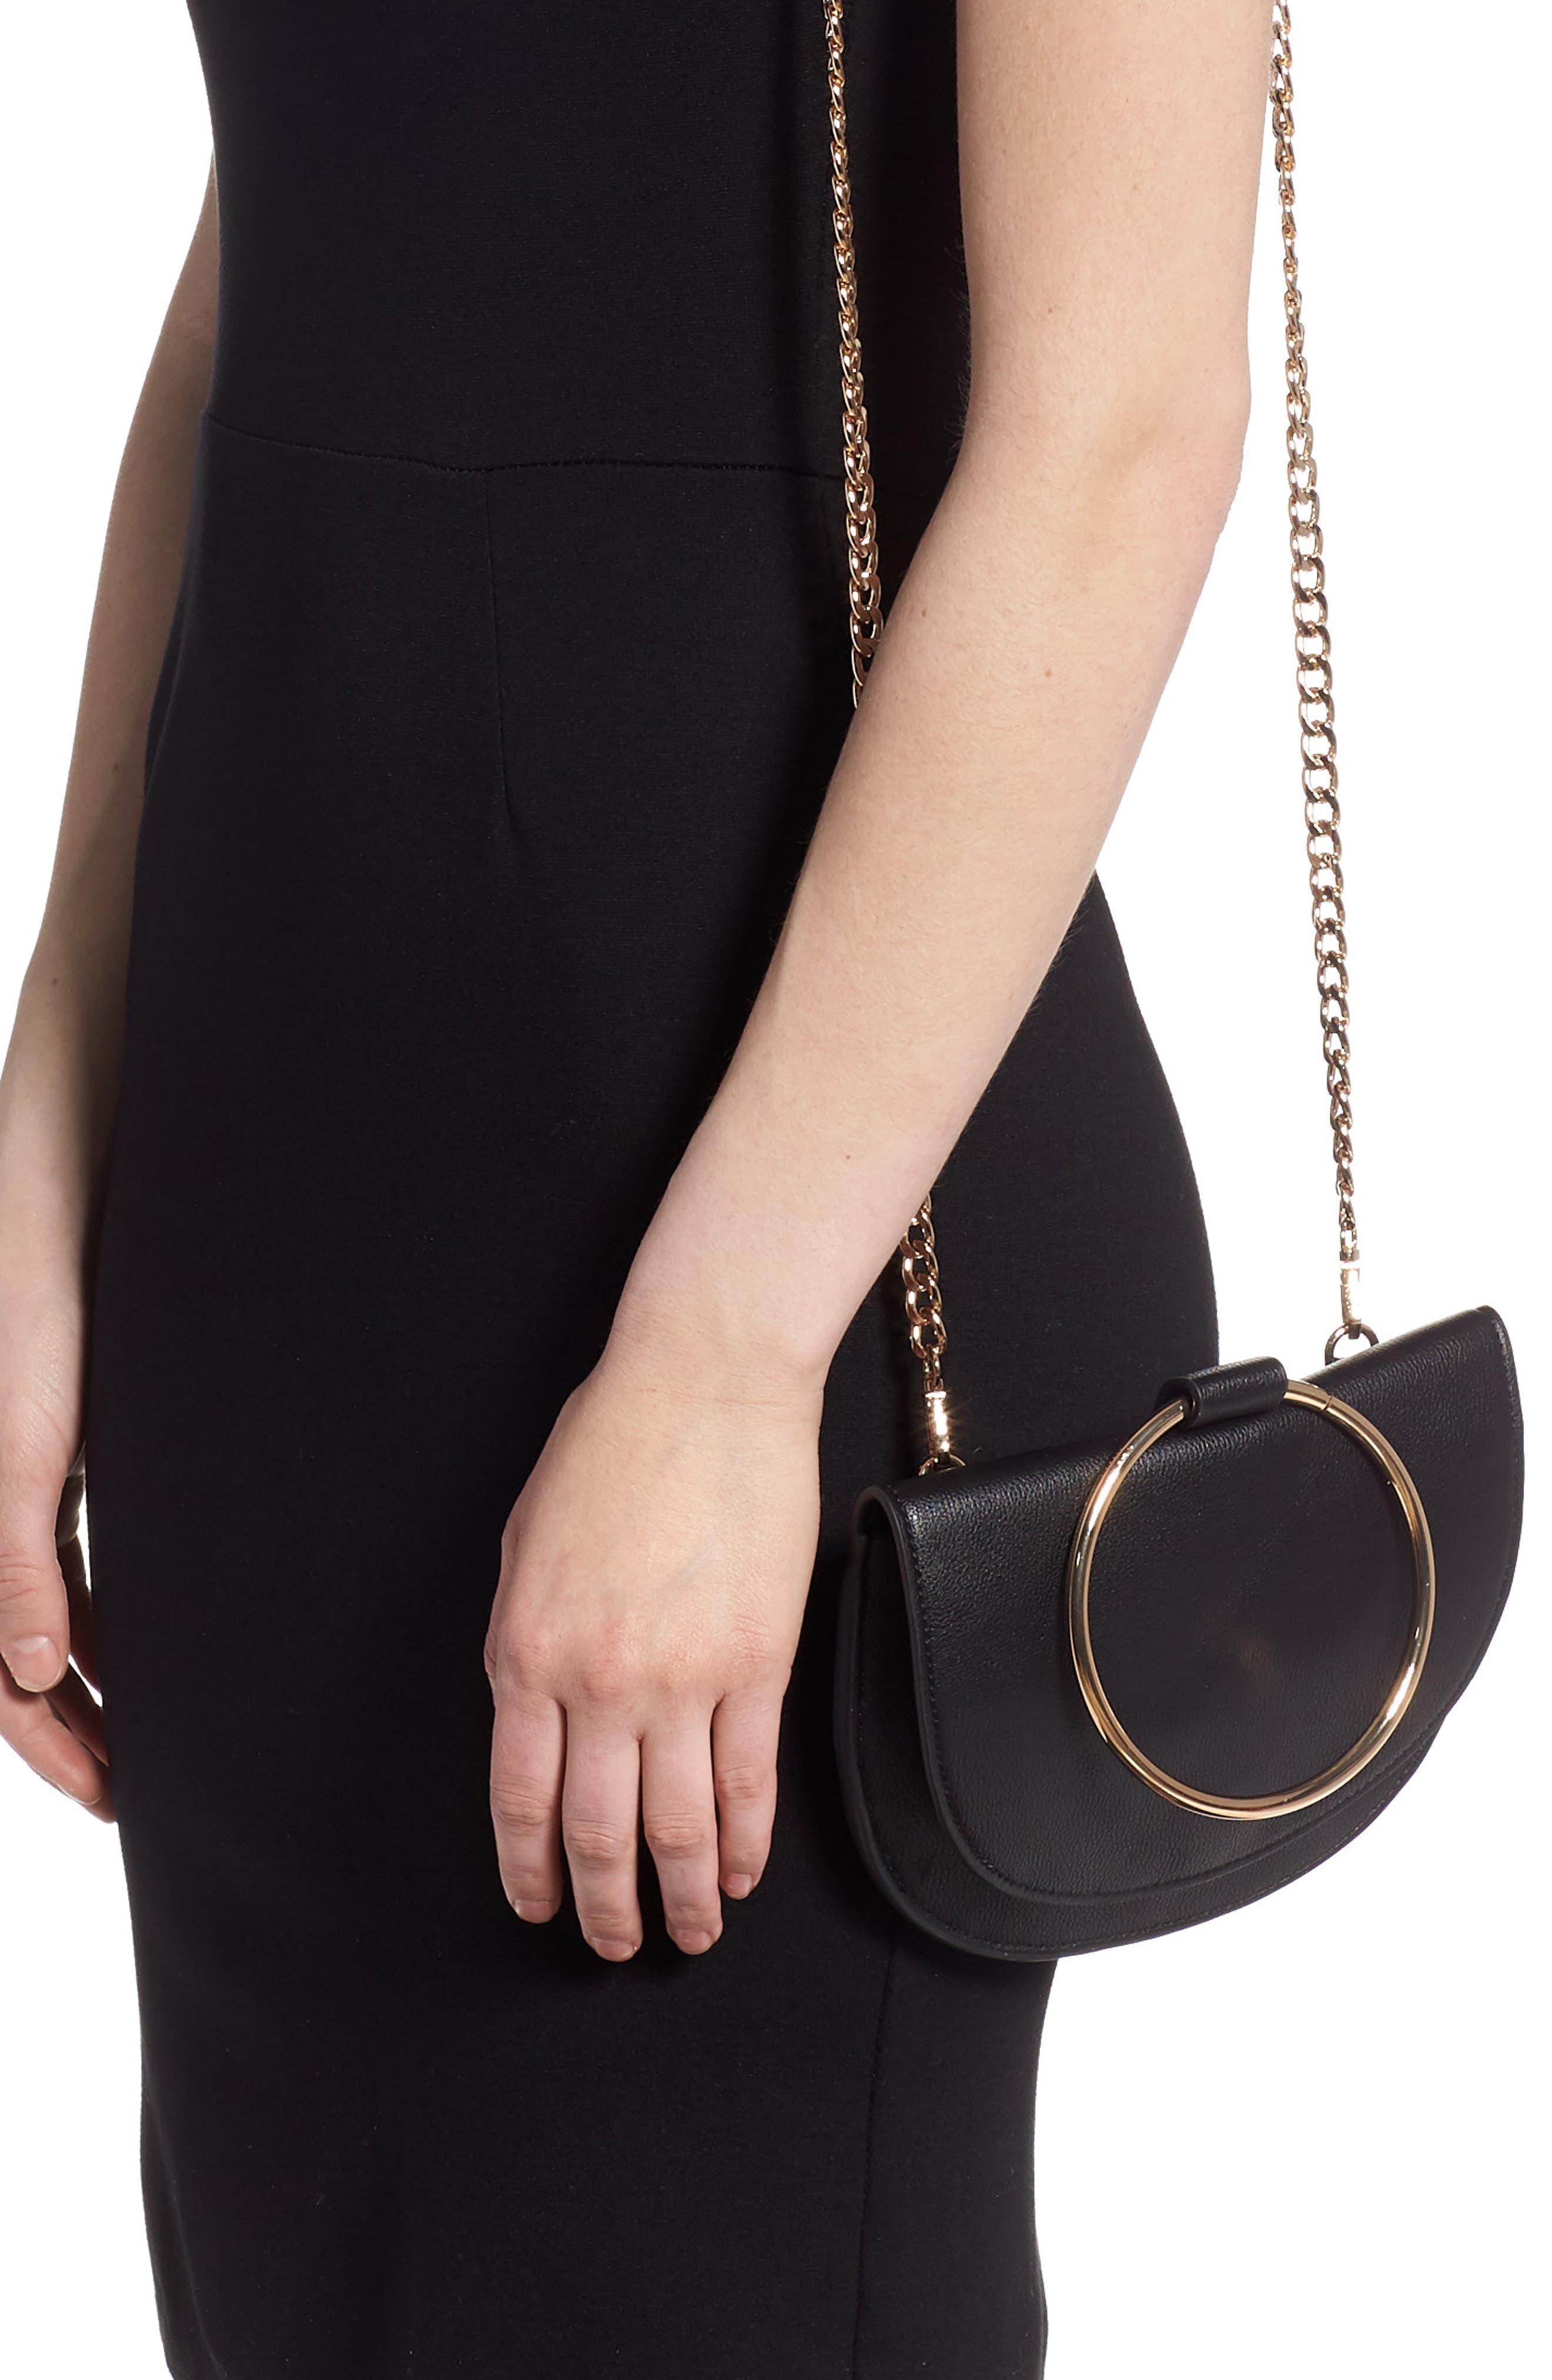 TROUVÉ, Reese Faux Leather Ring Crossbody Bag, Alternate thumbnail 2, color, BLACK